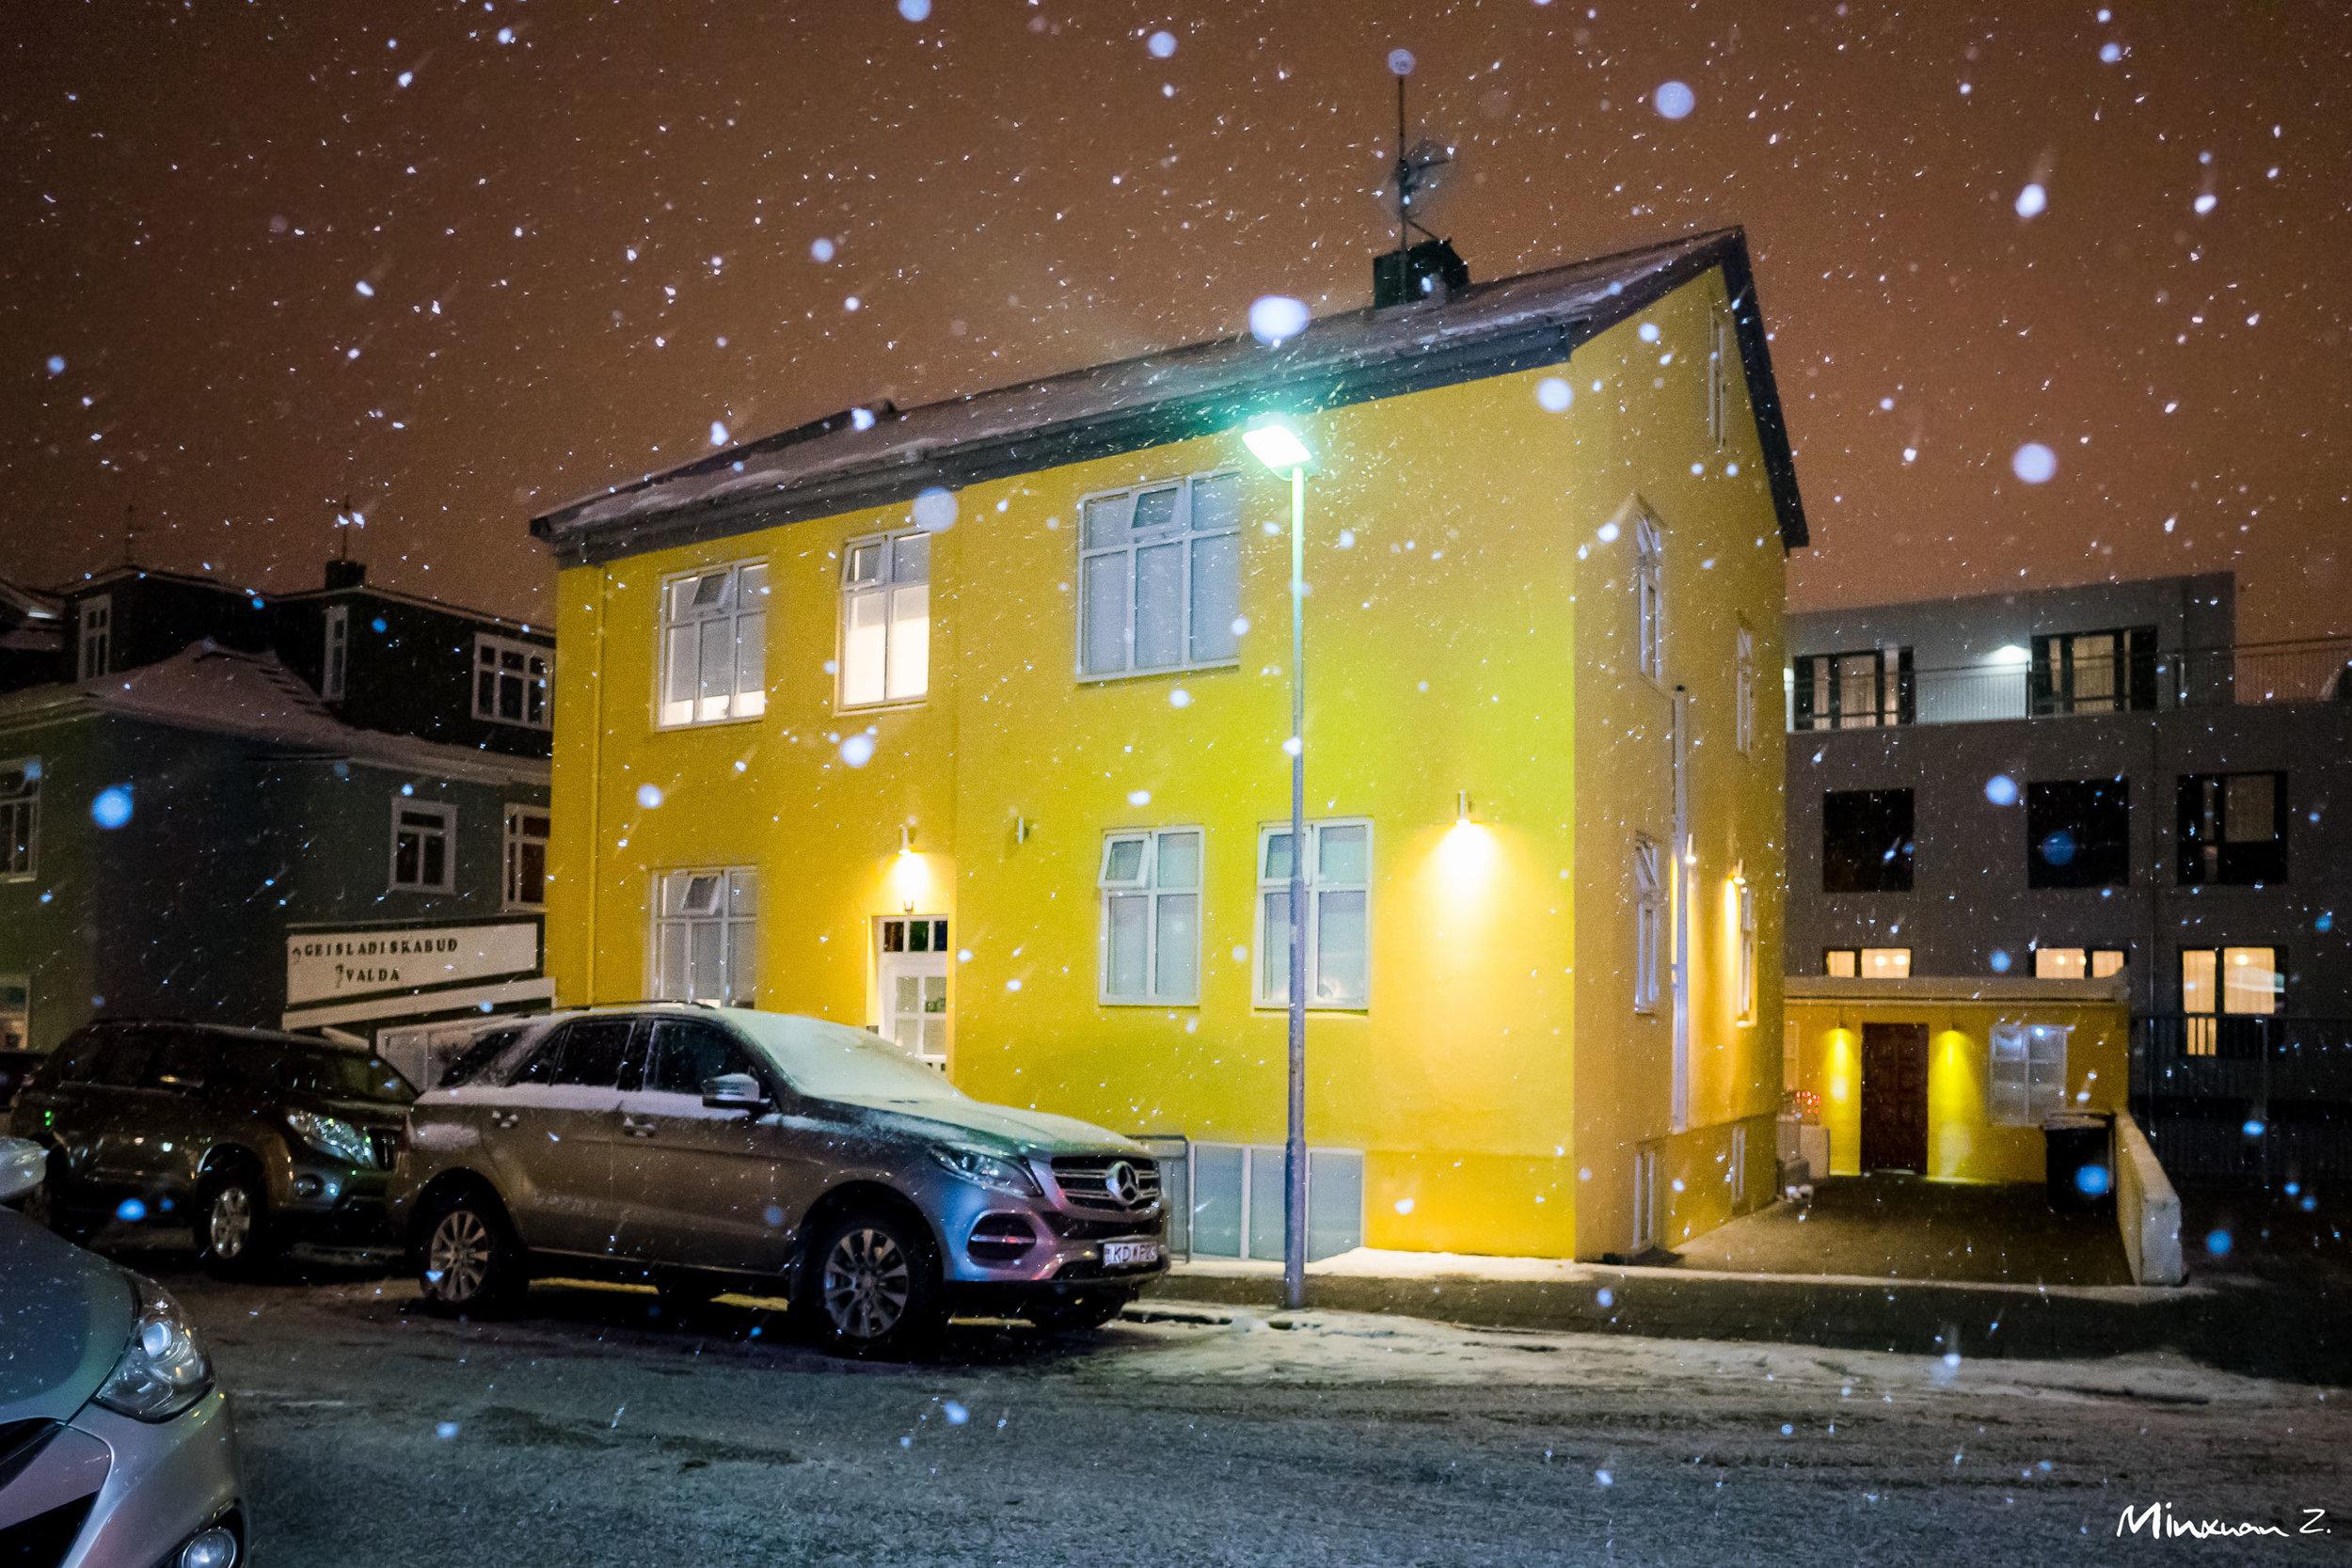 Xmas Eve in Reykjavík